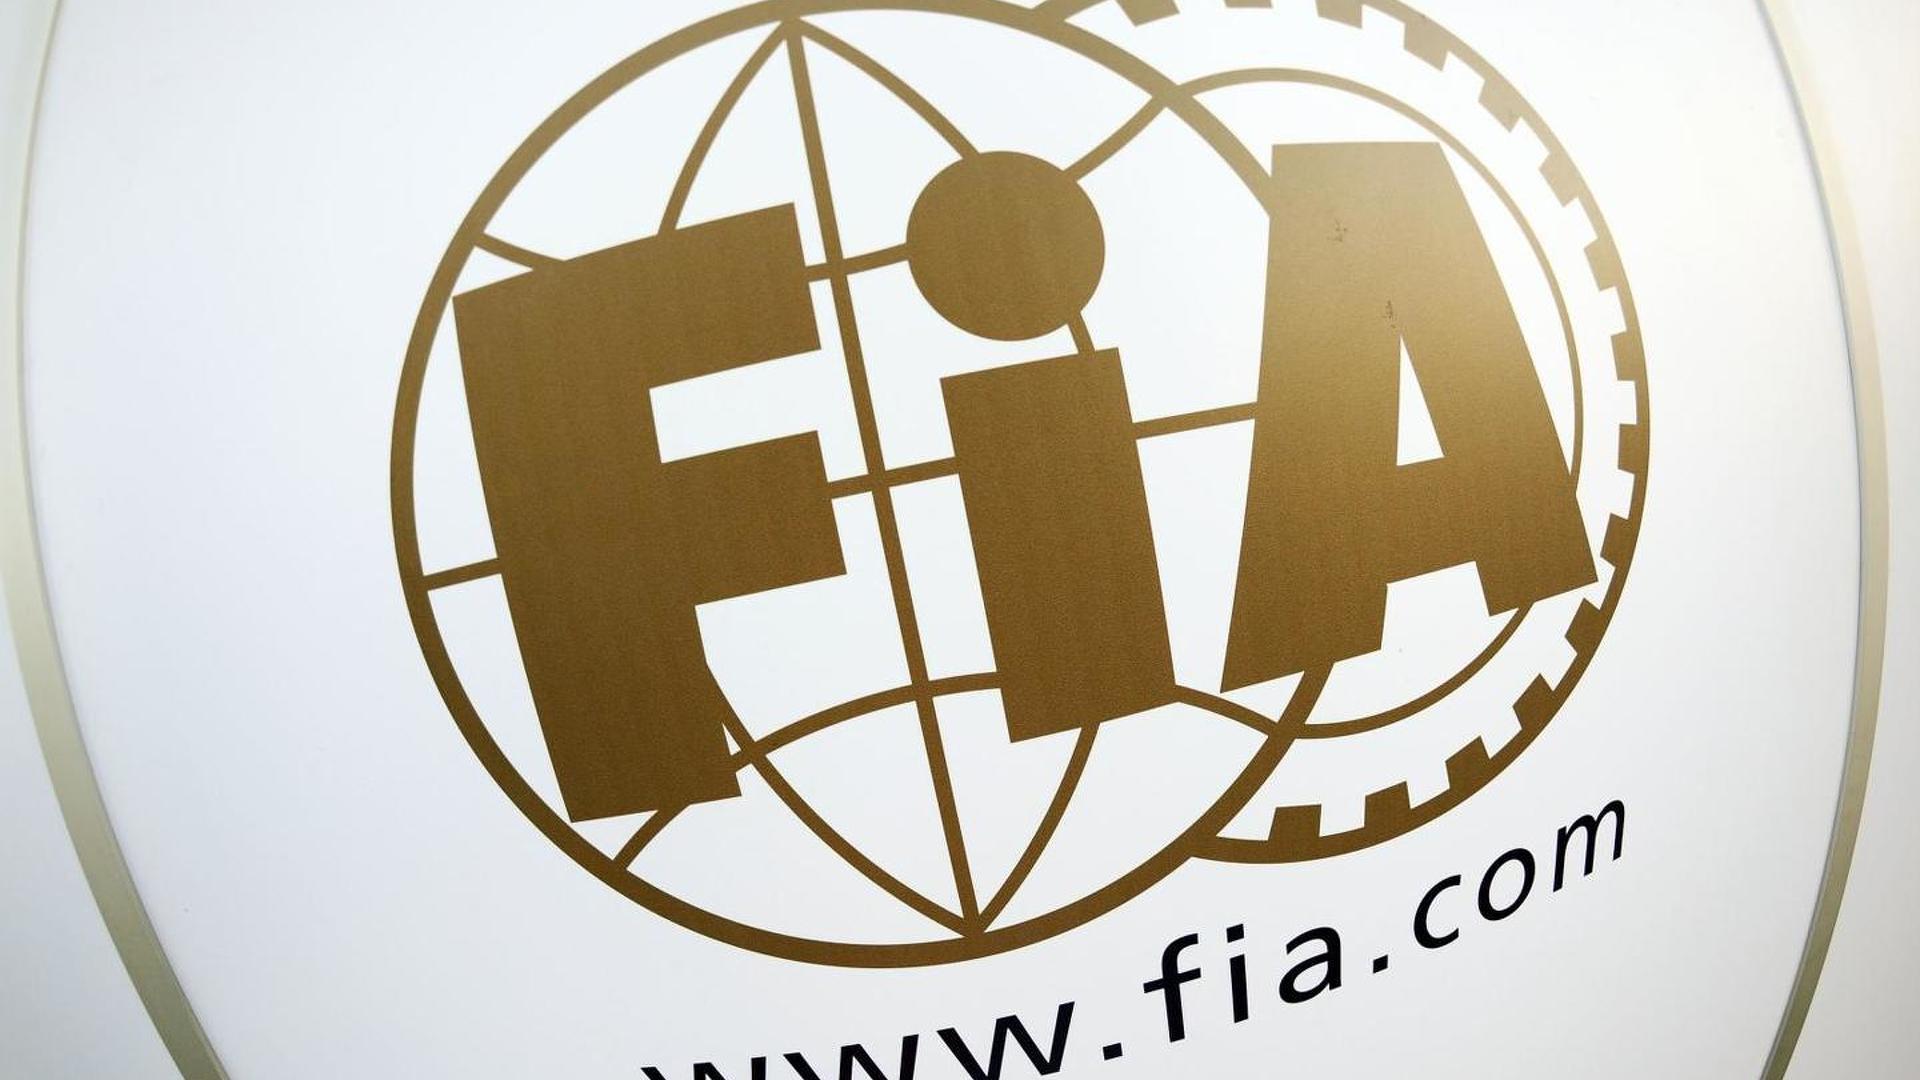 F1 'will be happy' with final calendar - Ecclestone